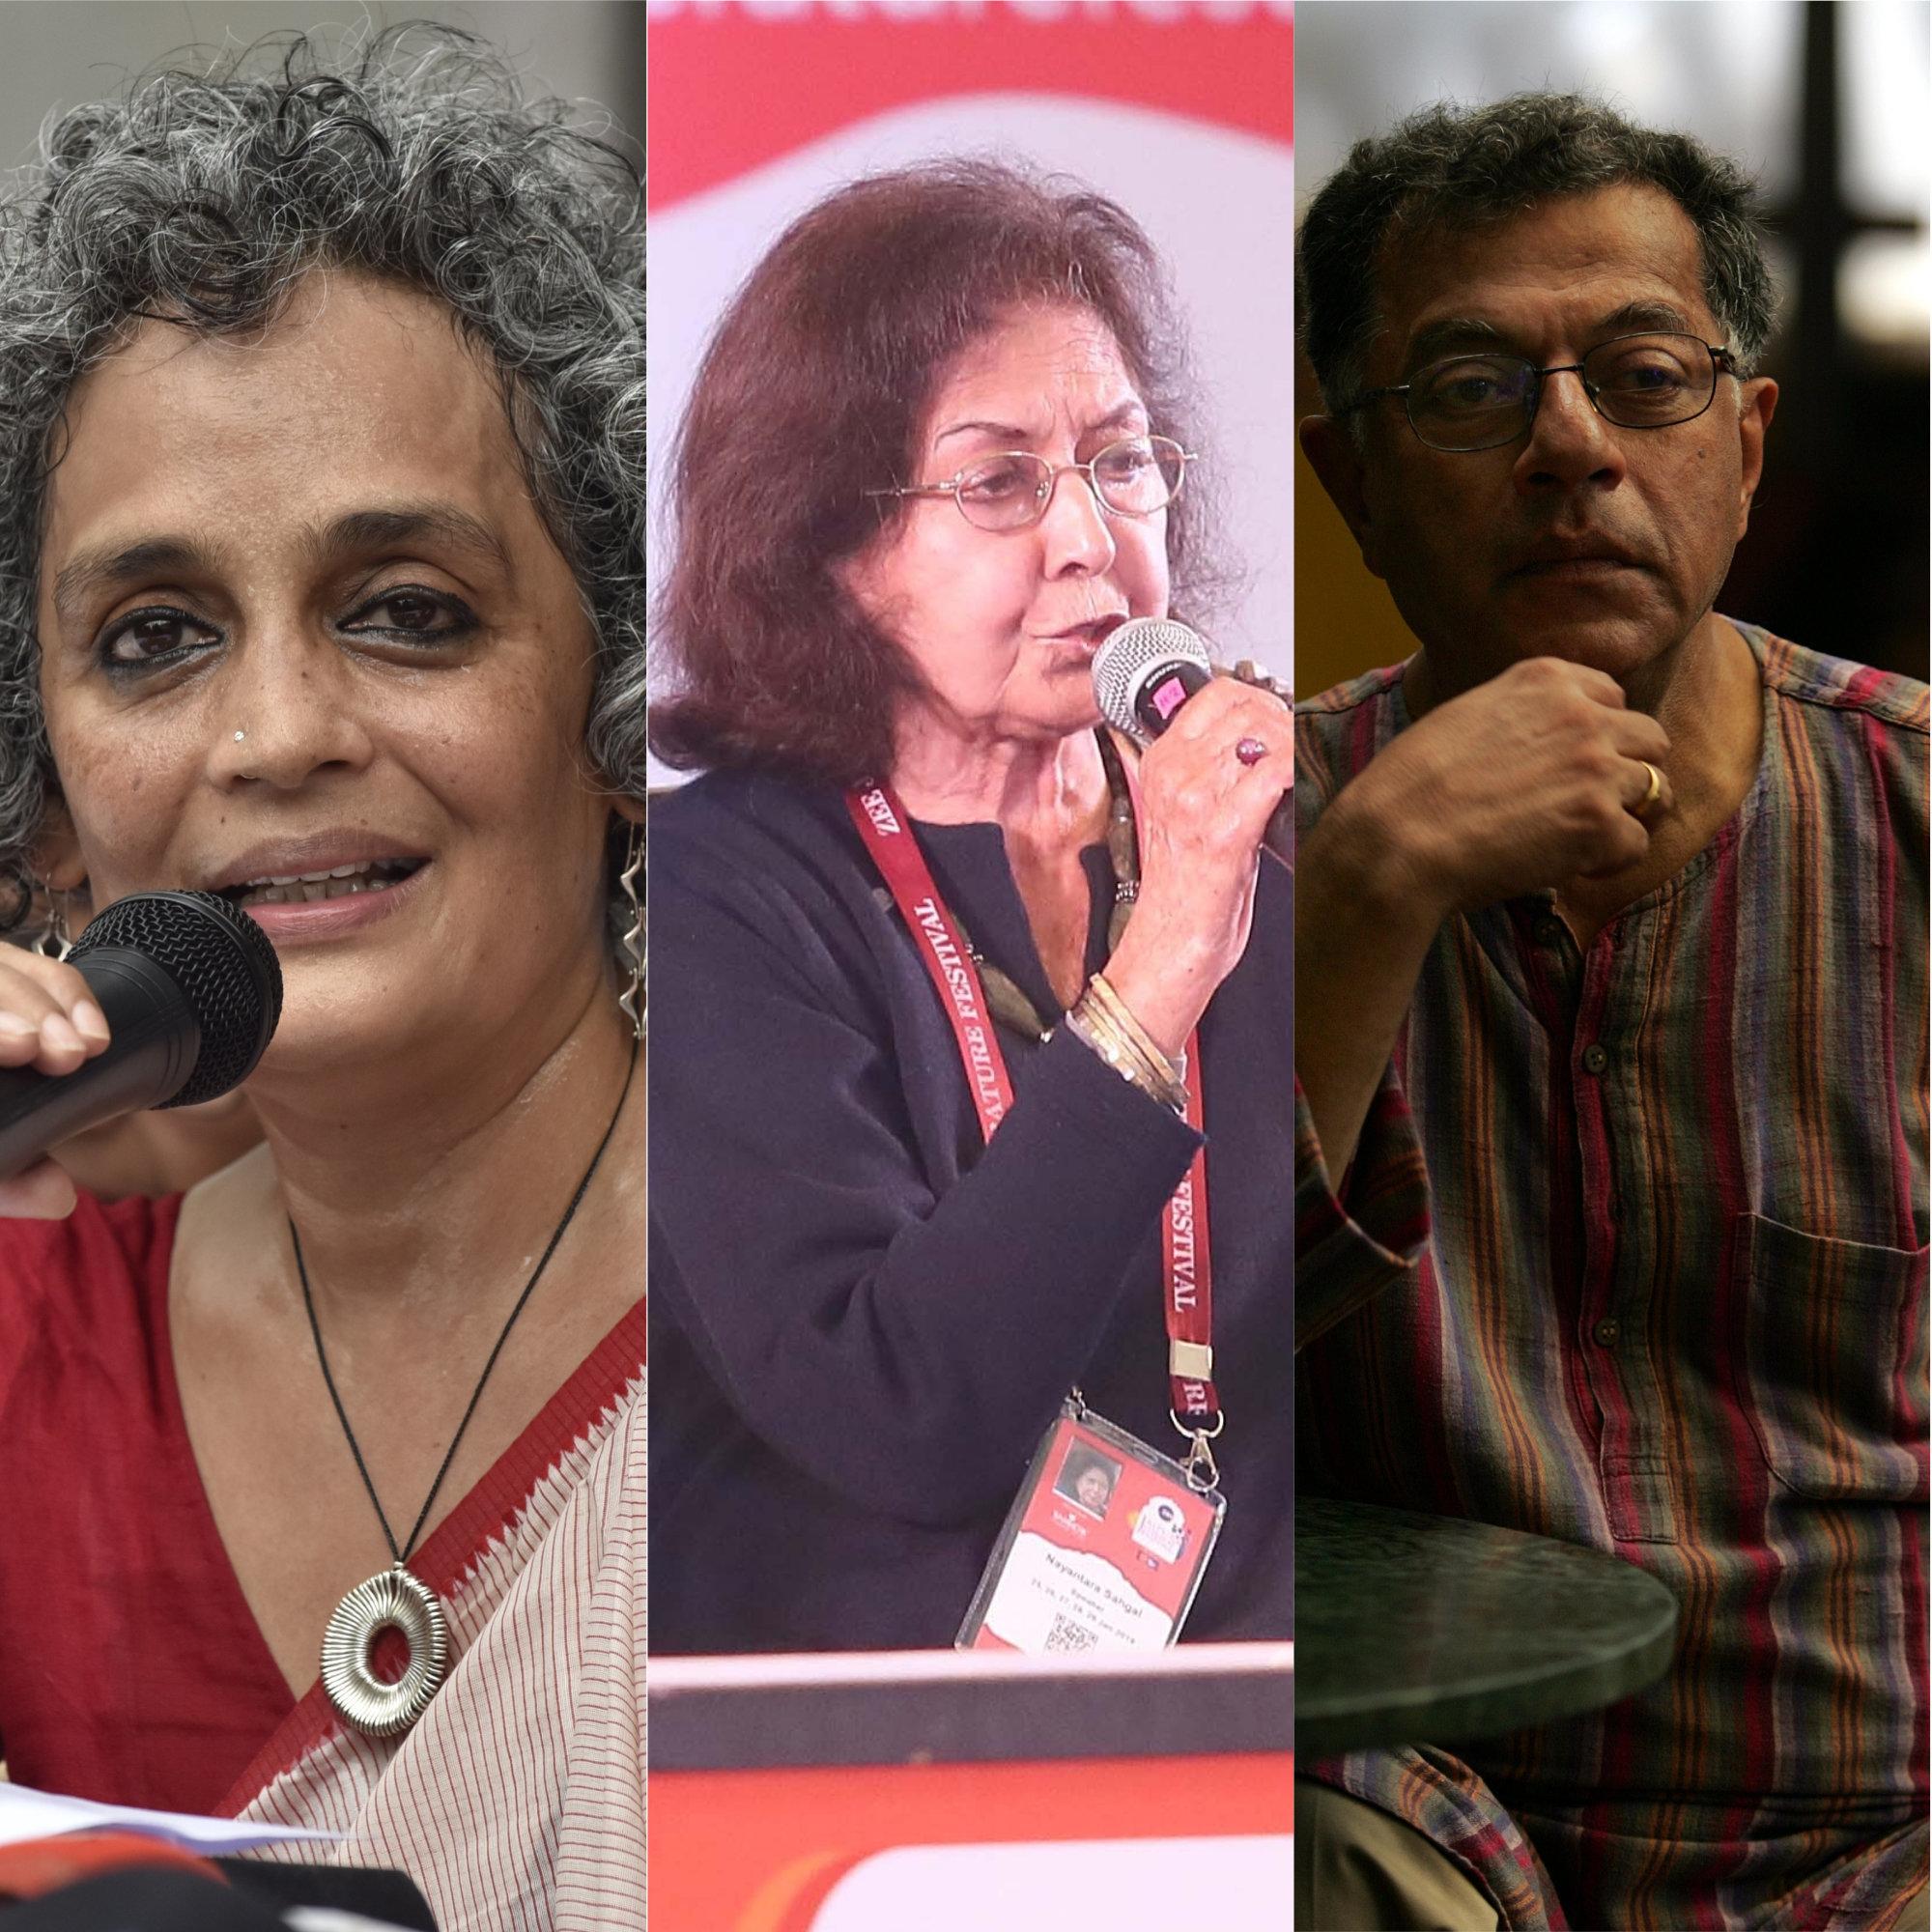 Arundhati Roy, Girish Karnad Among 210 Writers Asking People To Vote Against 'Hate